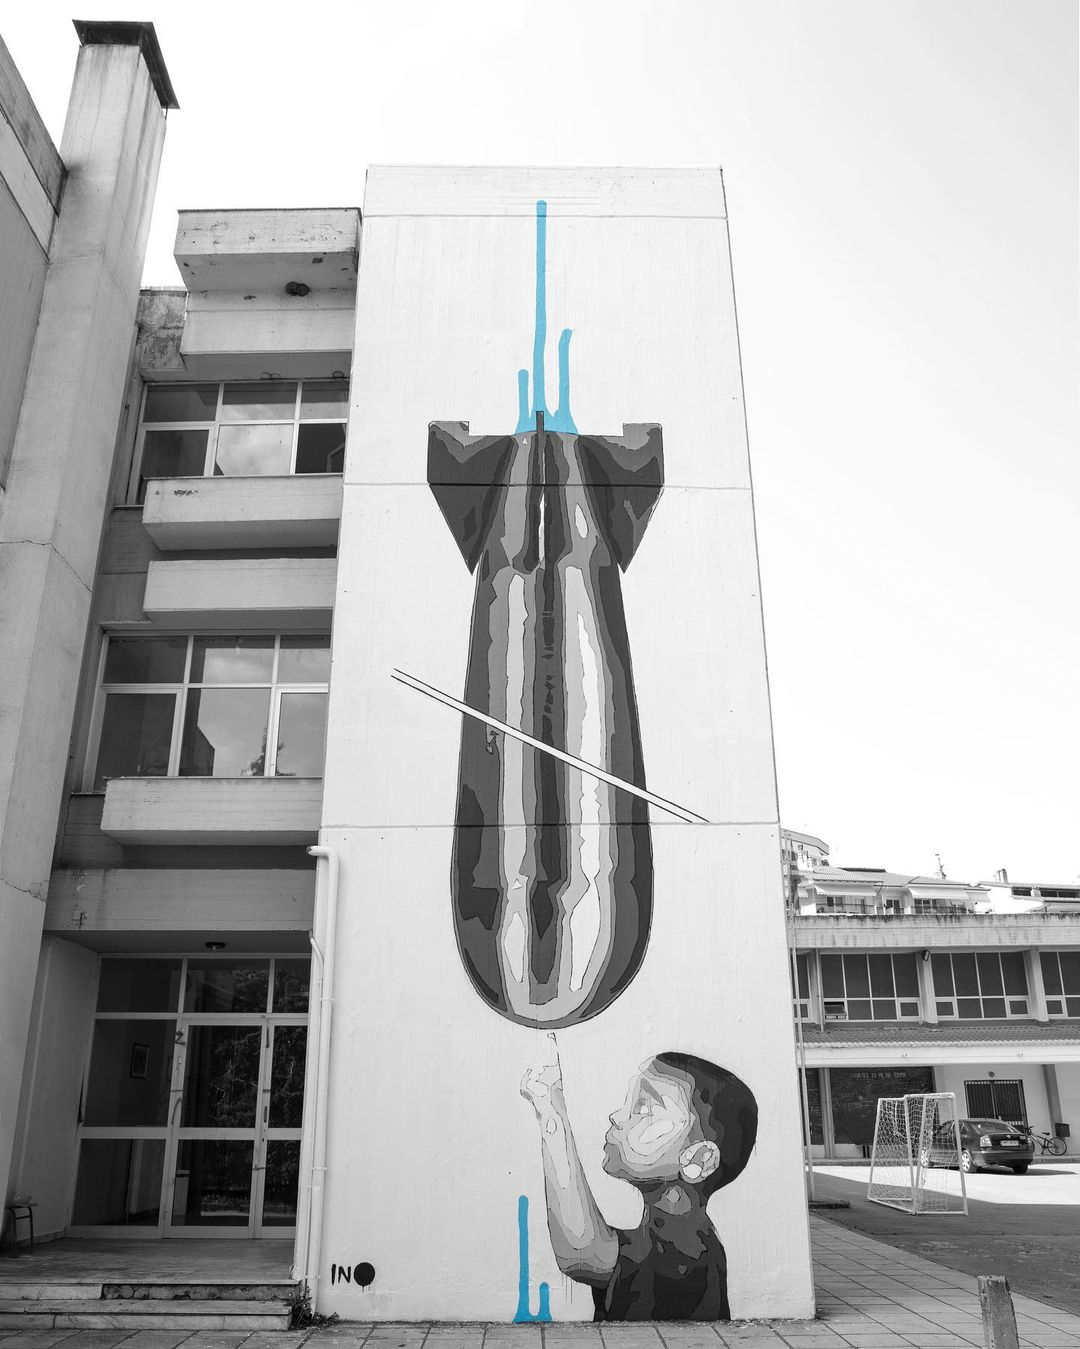 iNO @ Greece